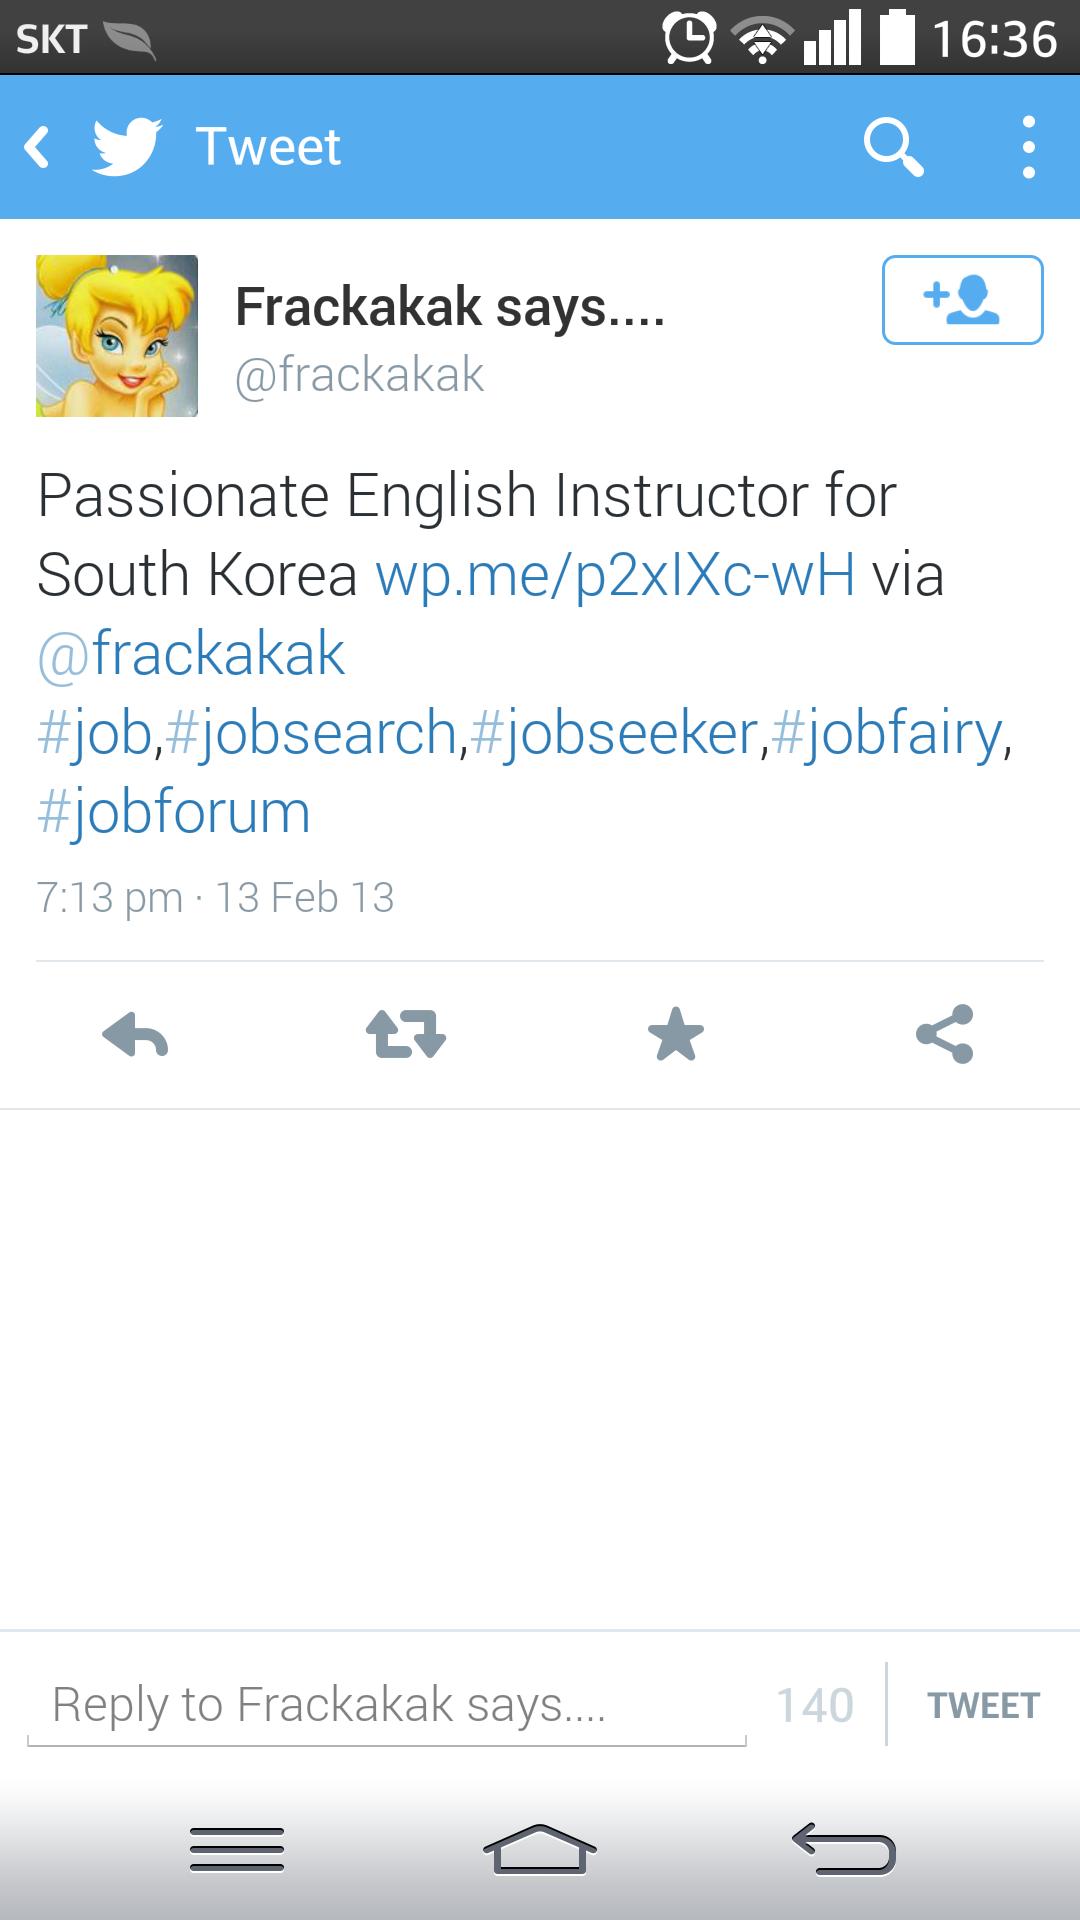 ways to an e s l job in korea whatawaygook wpid screenshot 2014 07 15 16 36 26 png